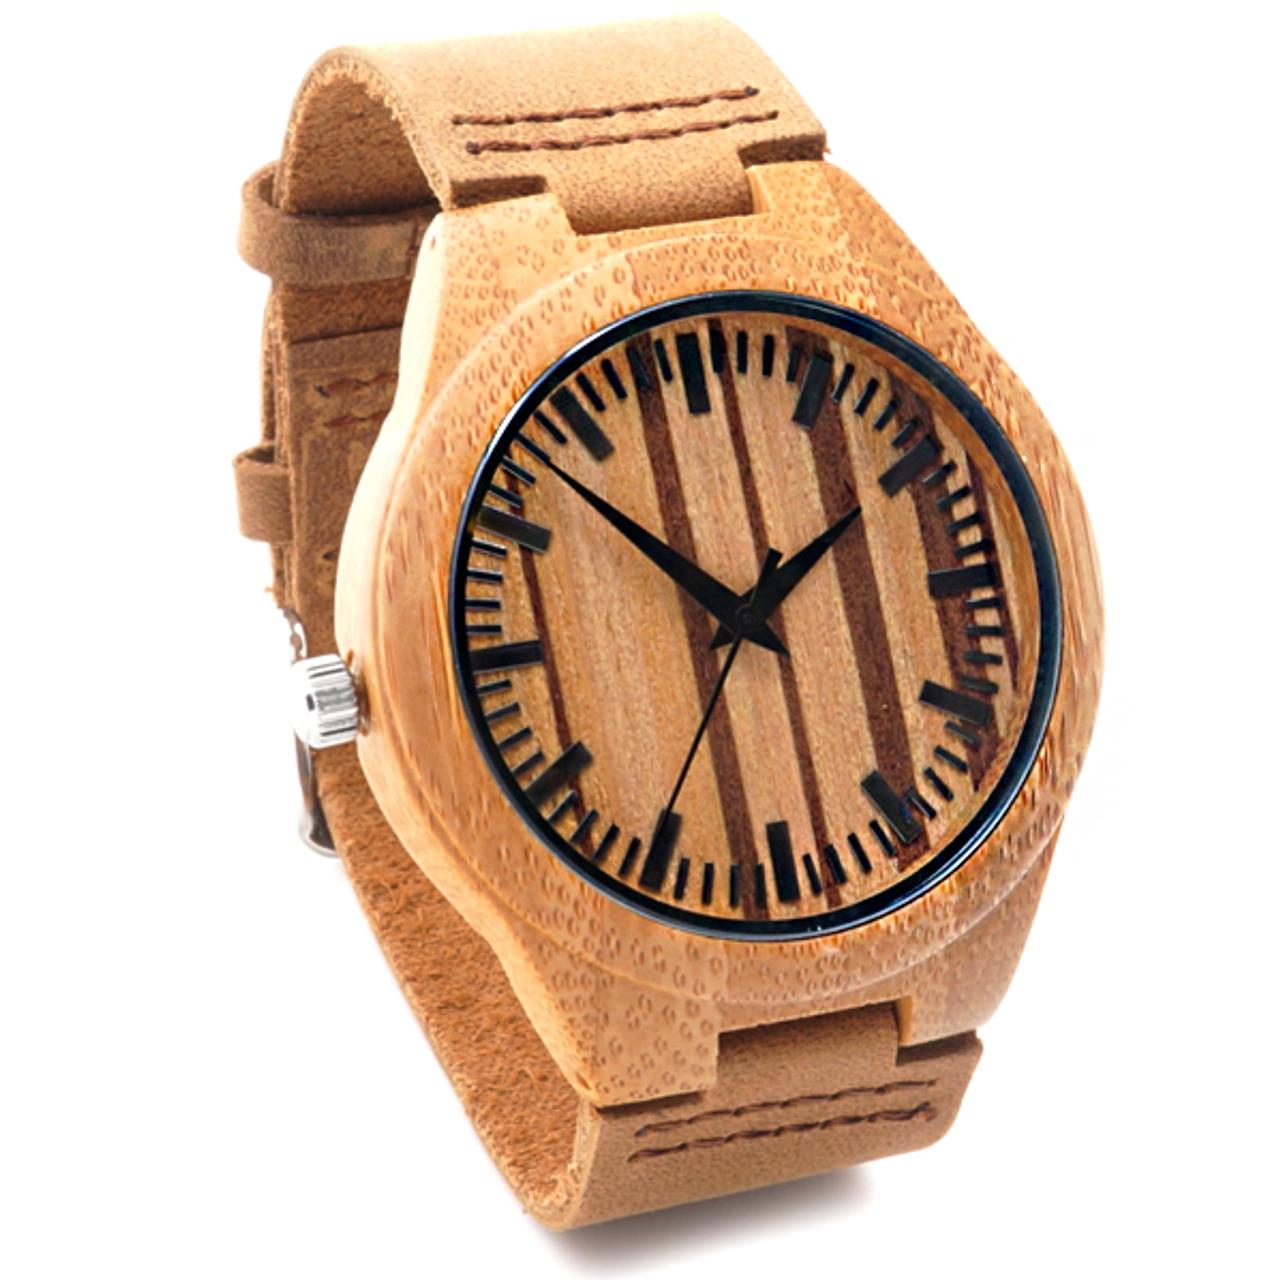 LUX - Personalized Watch W#58 - PinStripe